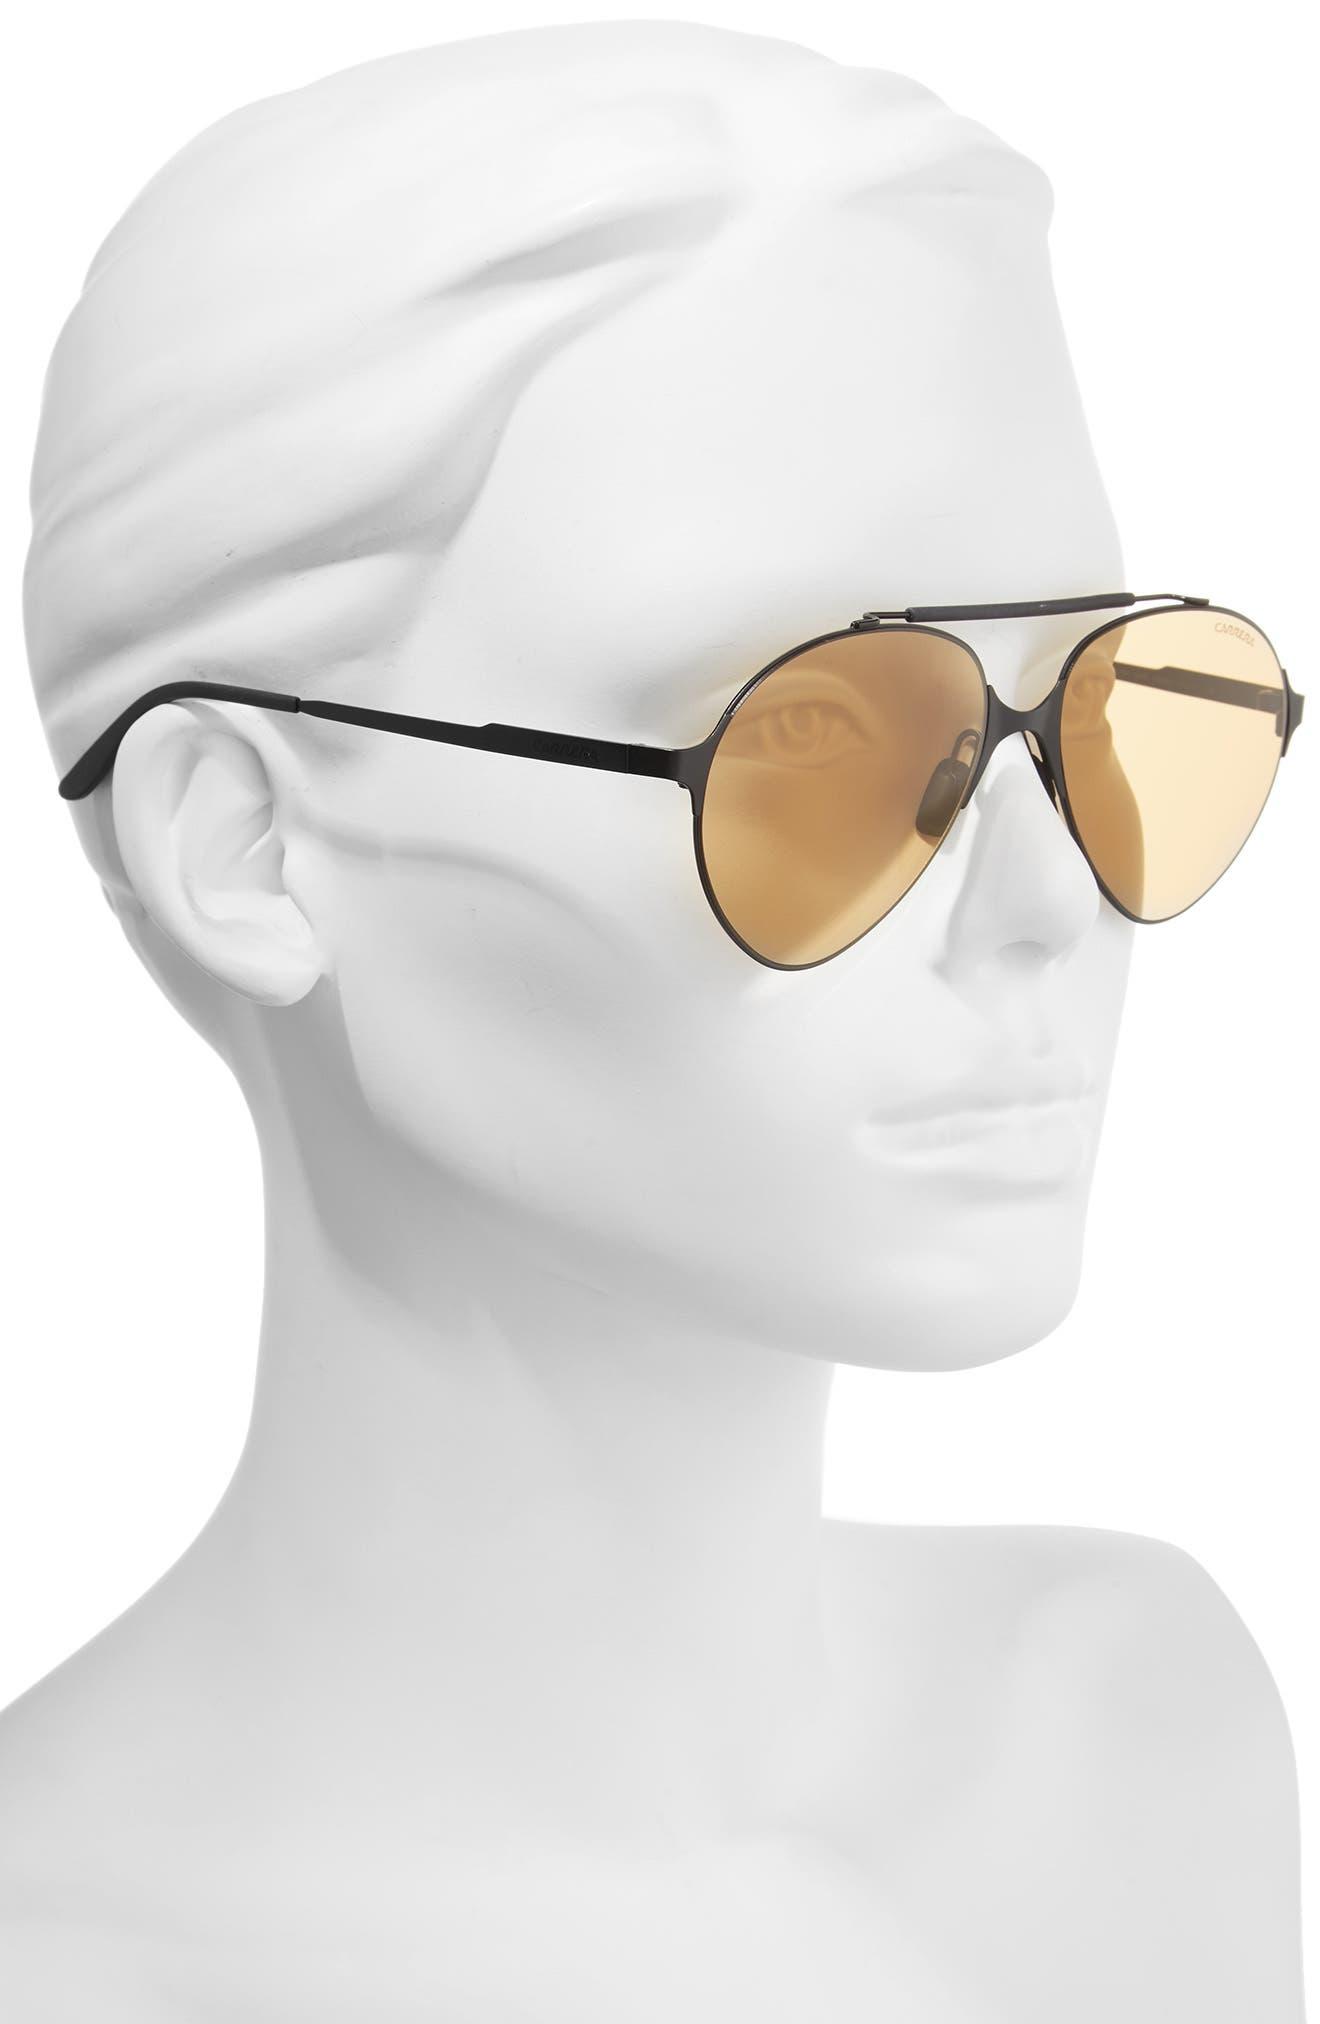 Carrera 58mm Gradient Pilot Sunglasses,                             Alternate thumbnail 2, color,                             001